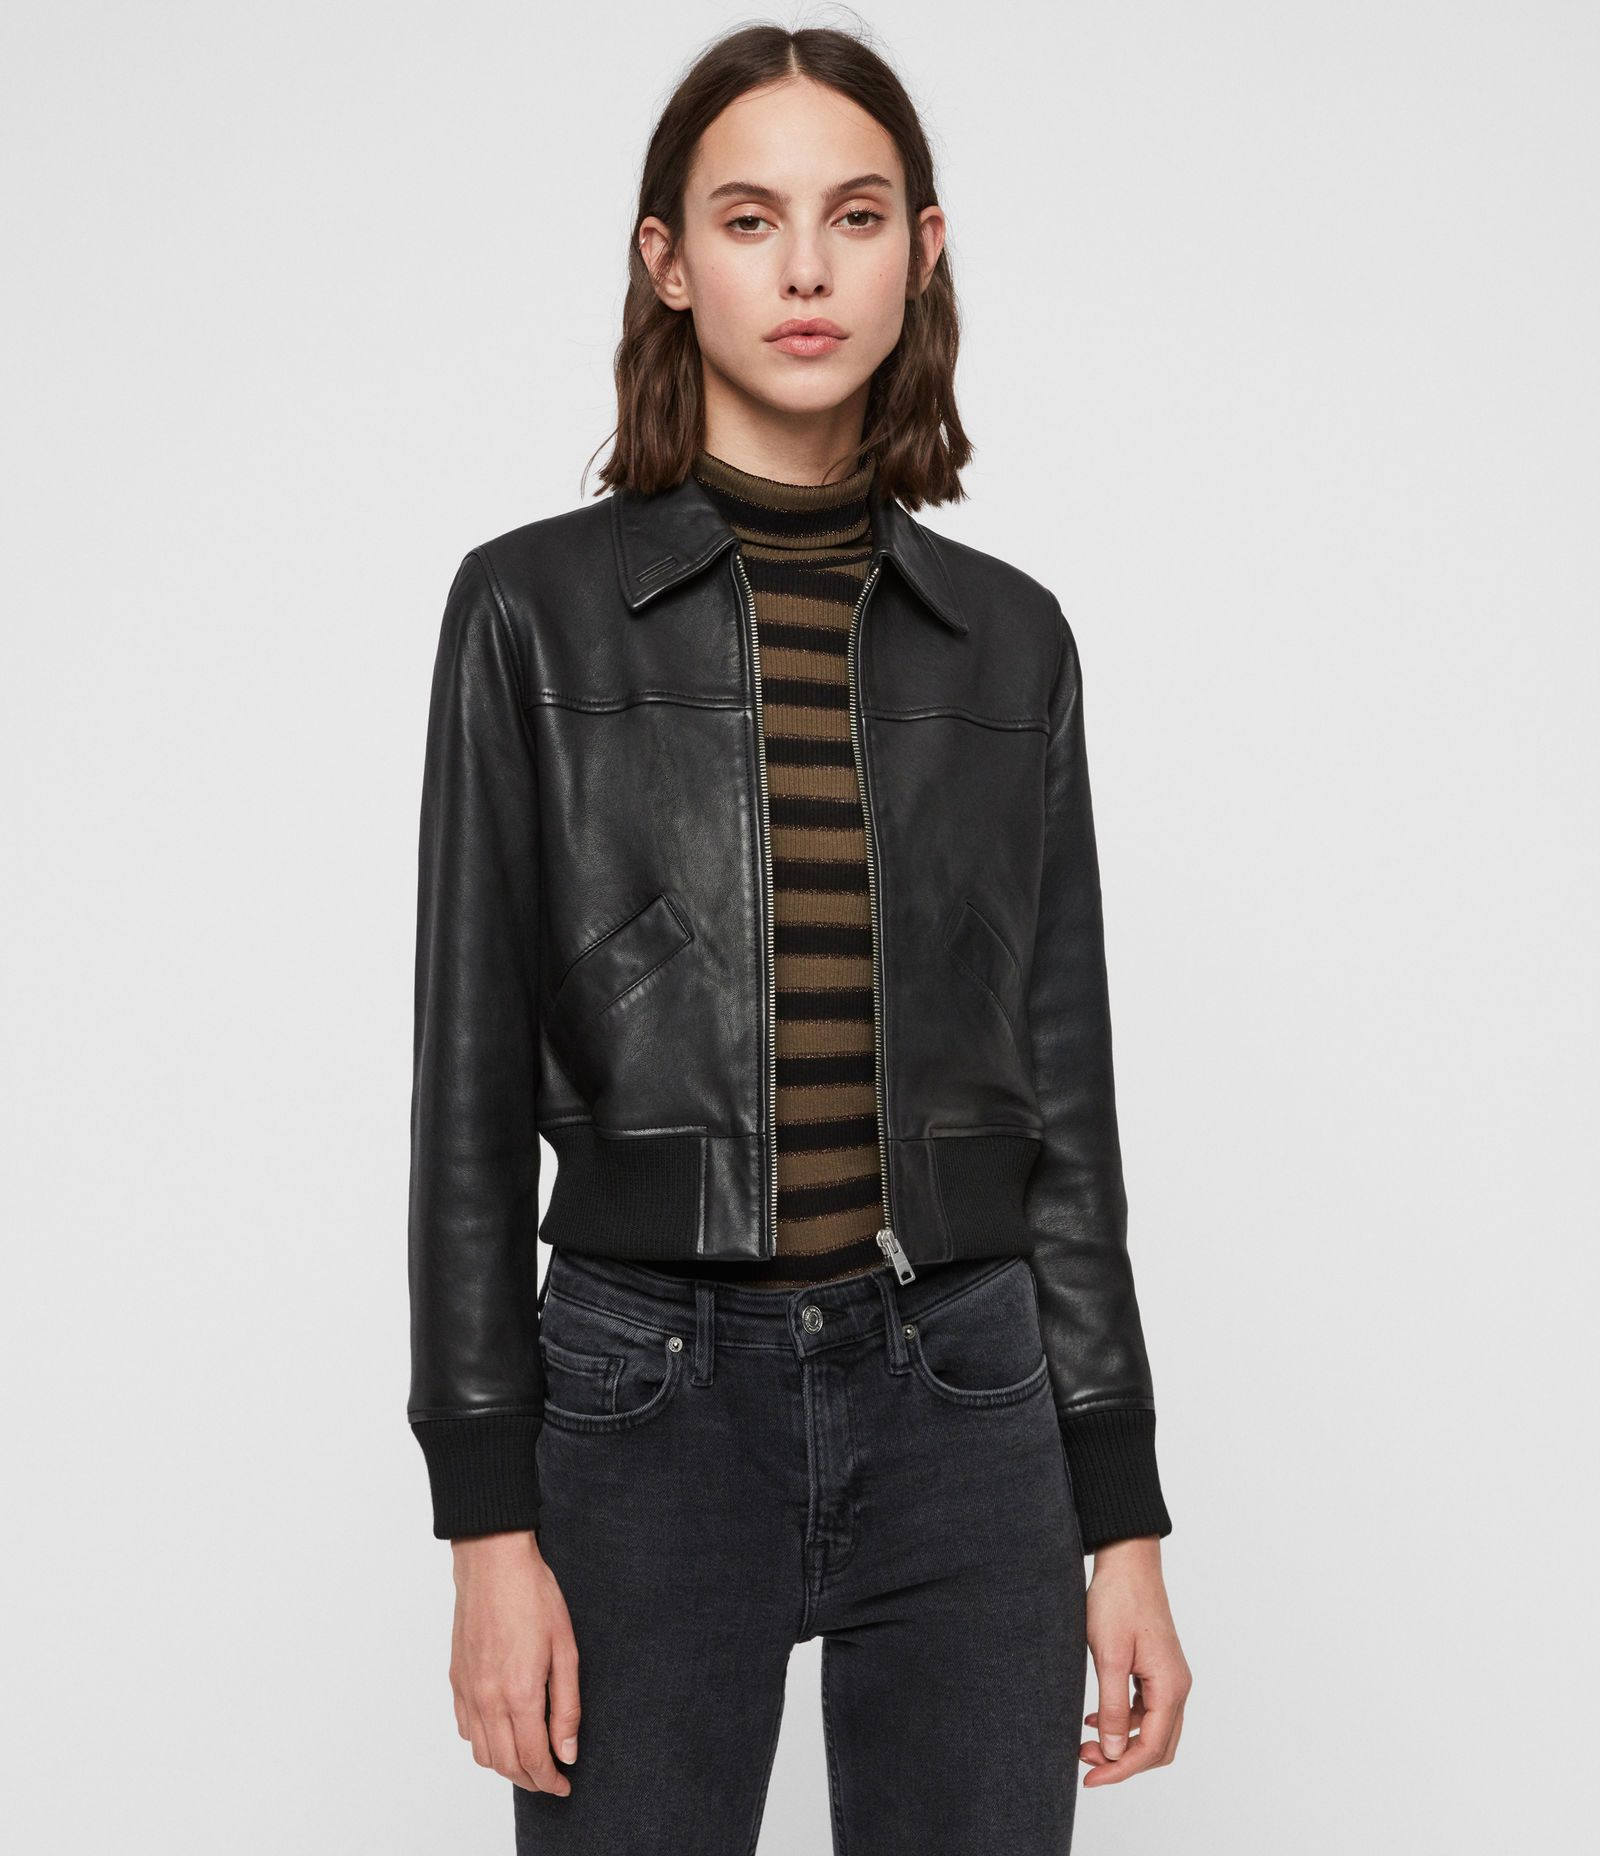 Allsaints Us Womens Pascao Leather Bomber Jacket Black Leather Jackets Women Leather Jacket Black Bomber Jacket [ 1856 x 1600 Pixel ]